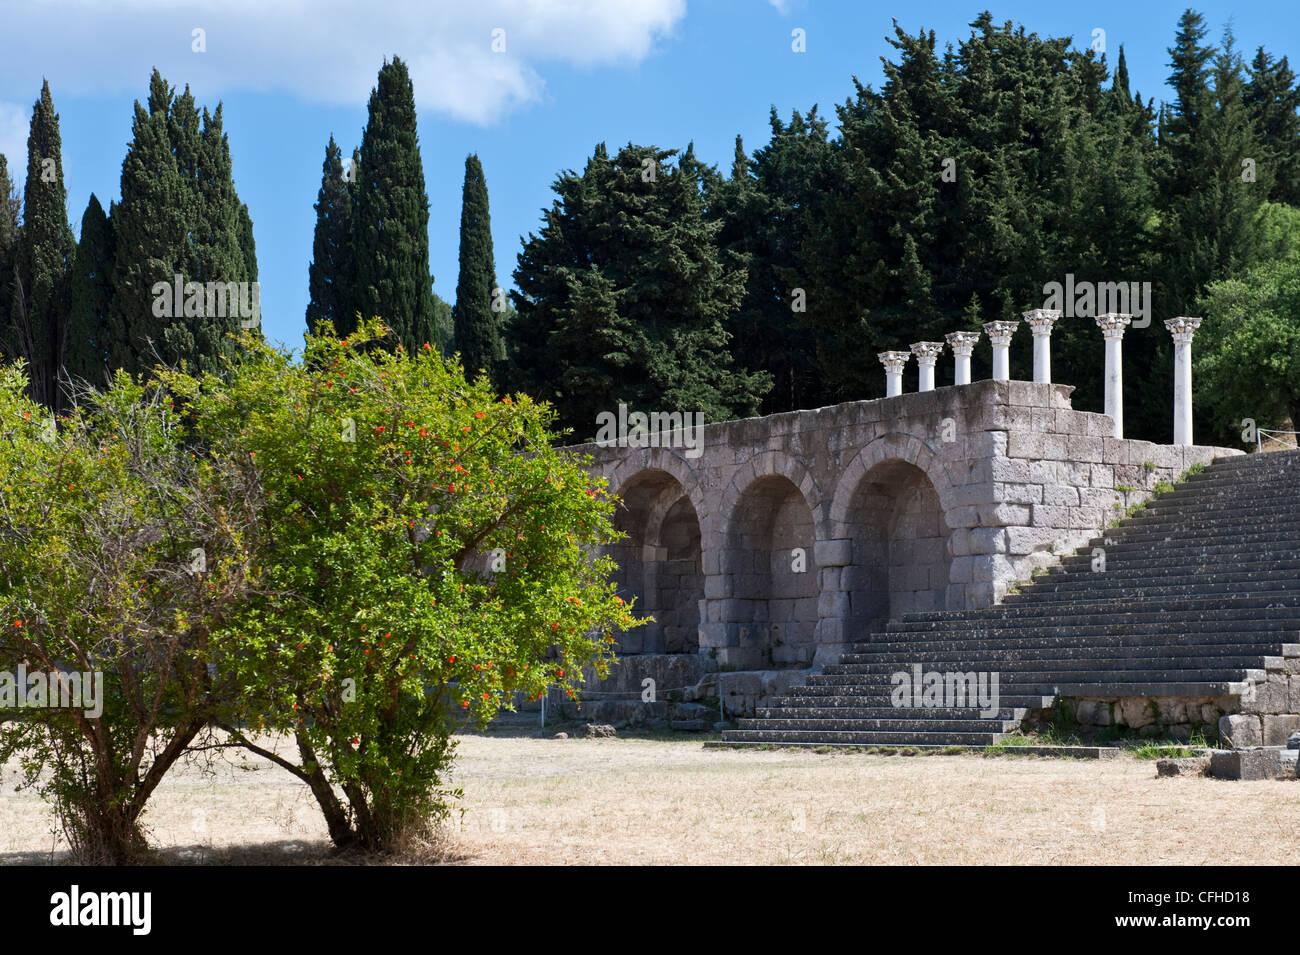 Greece, Dodecanese, Kos, the Asclepieion archaelogical site - Stock Image